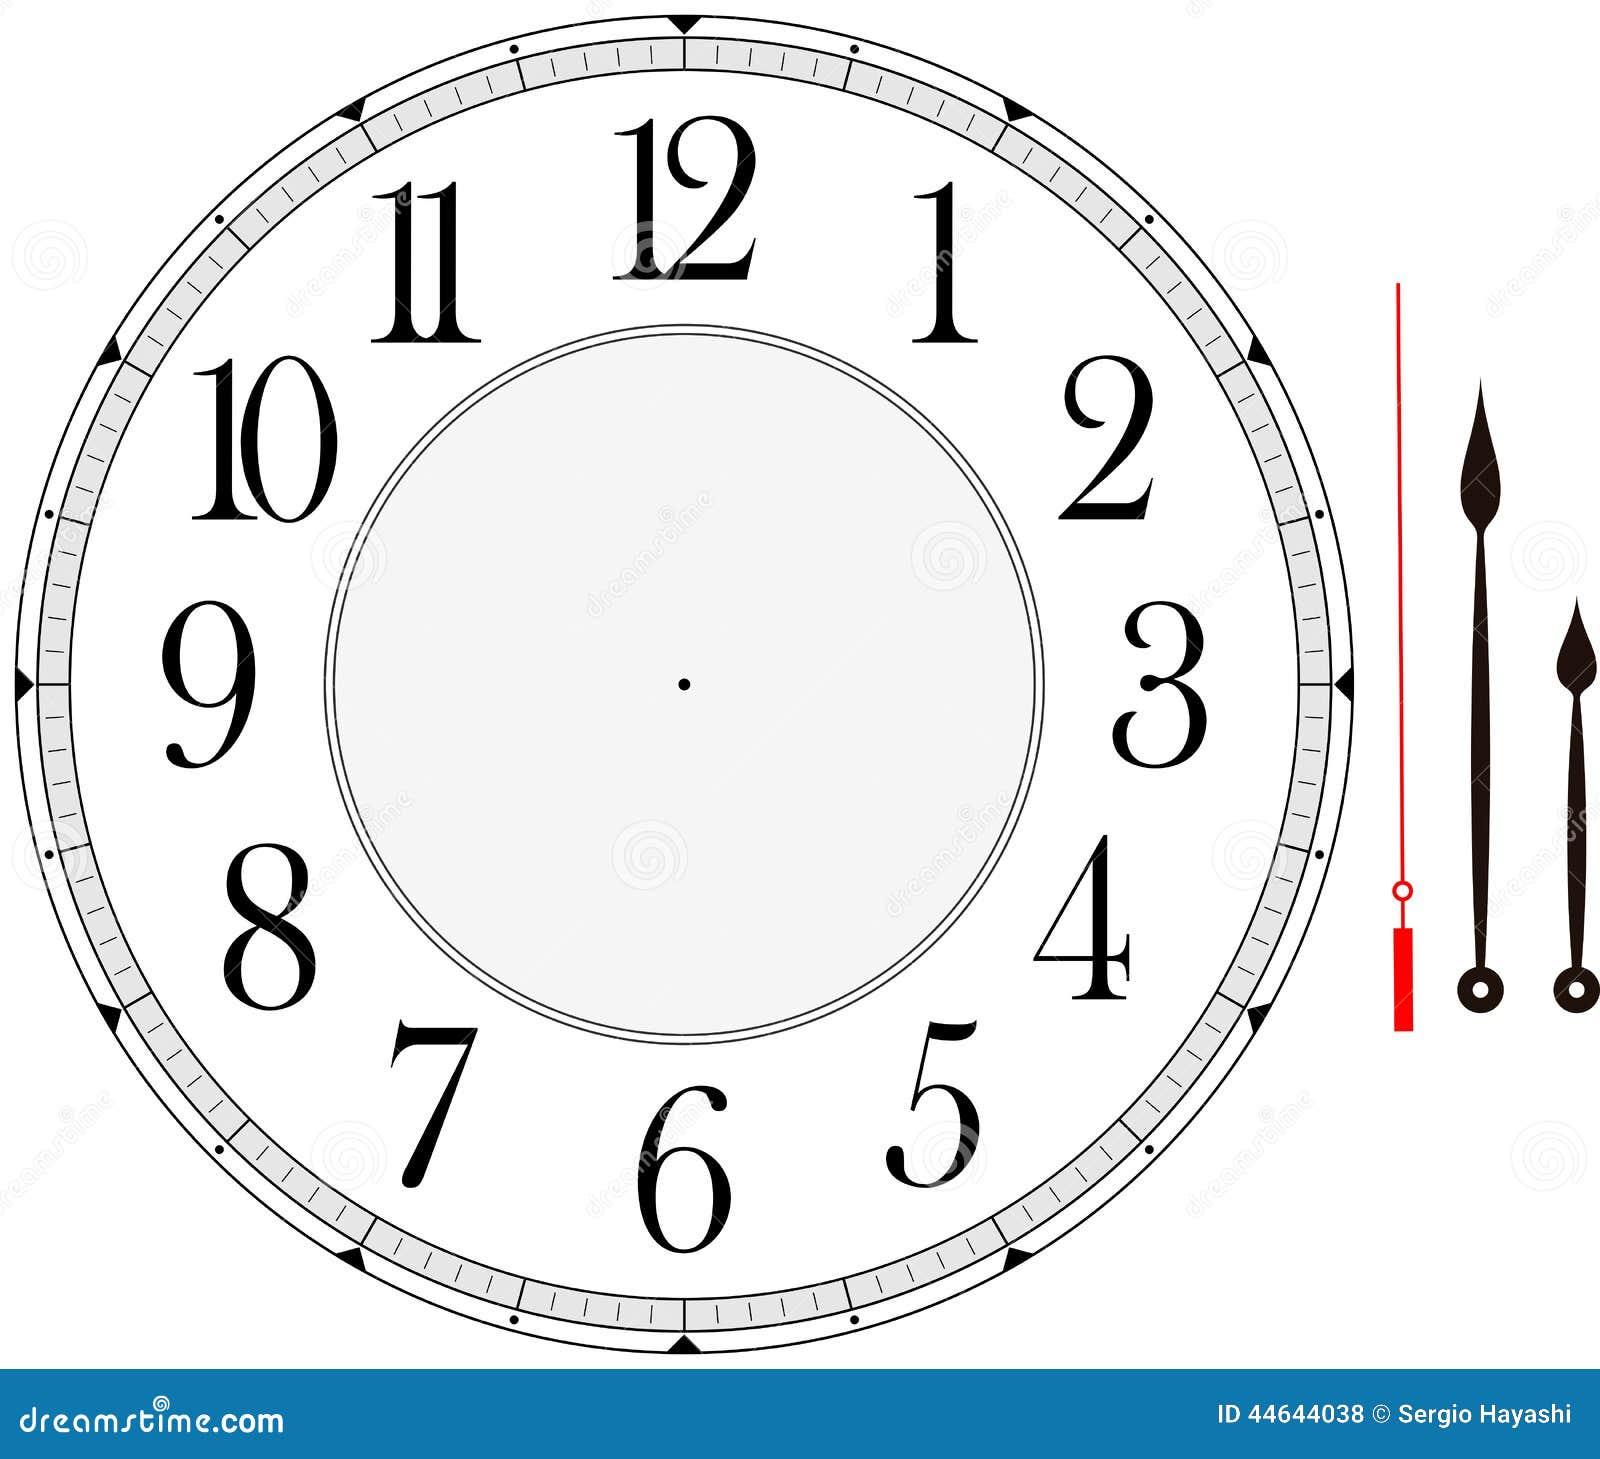 Clock Face Stock Vector - Image: 44644038